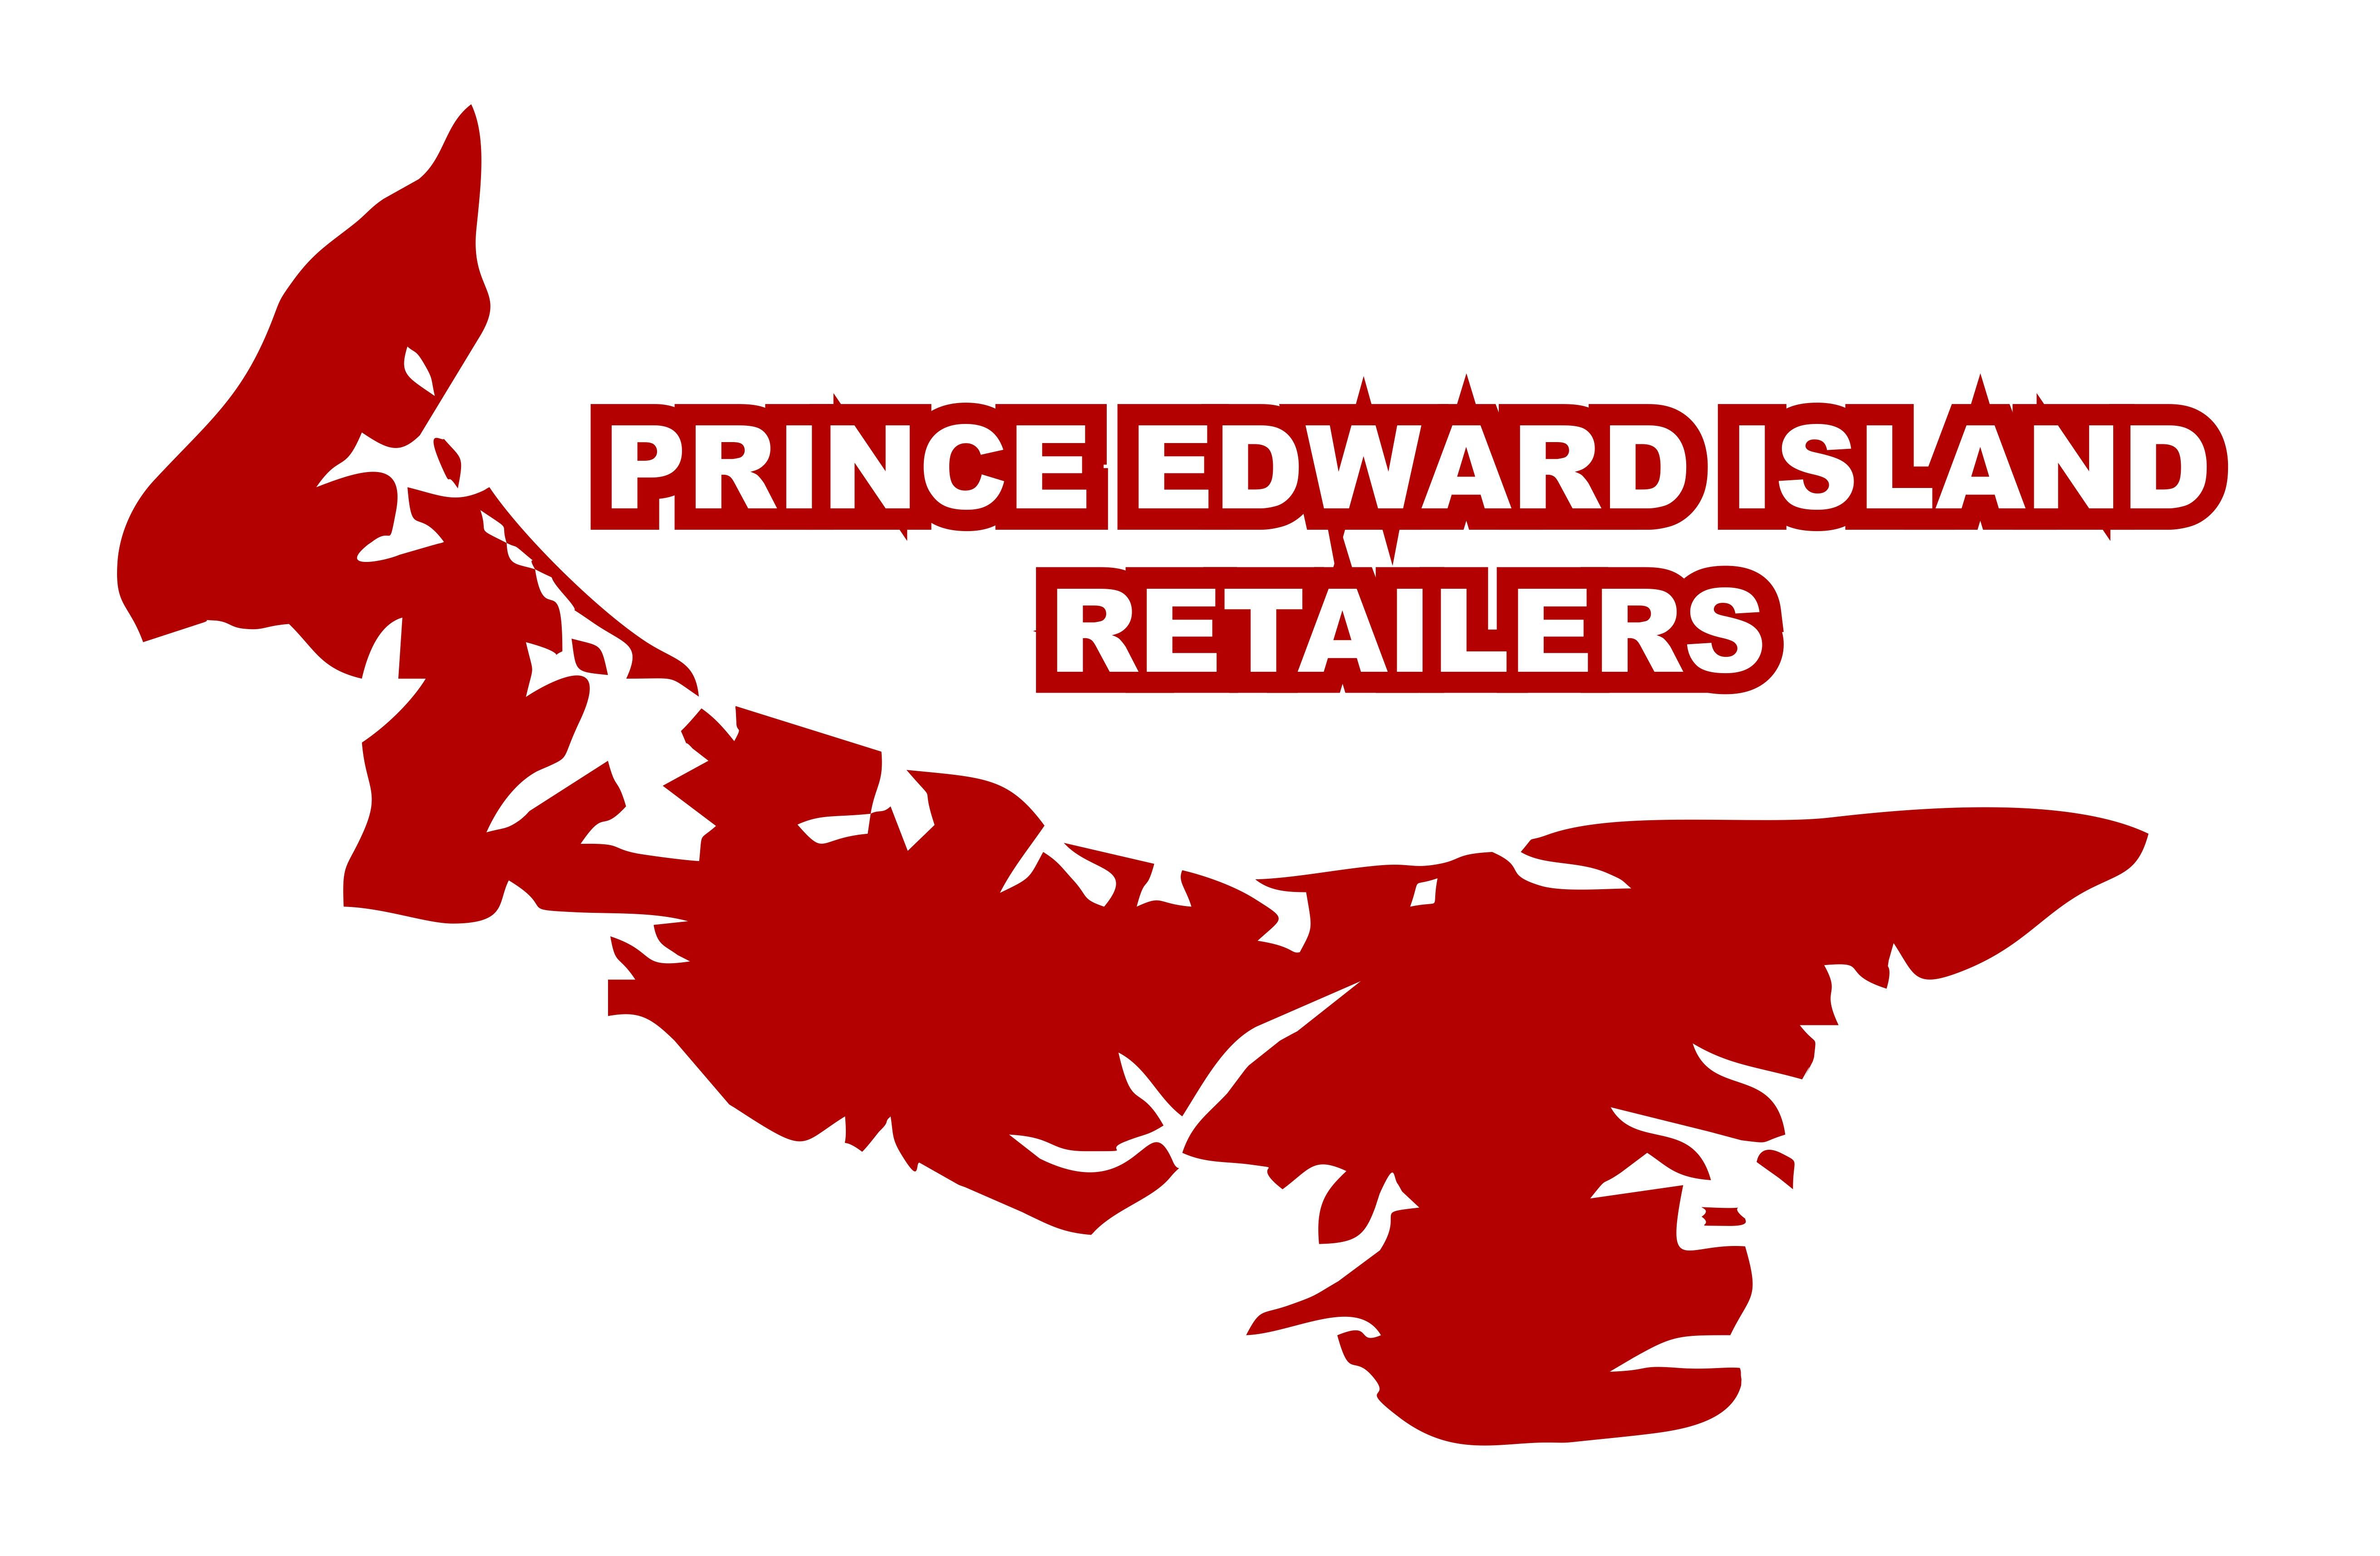 prince-edward-island-retailers.jpg